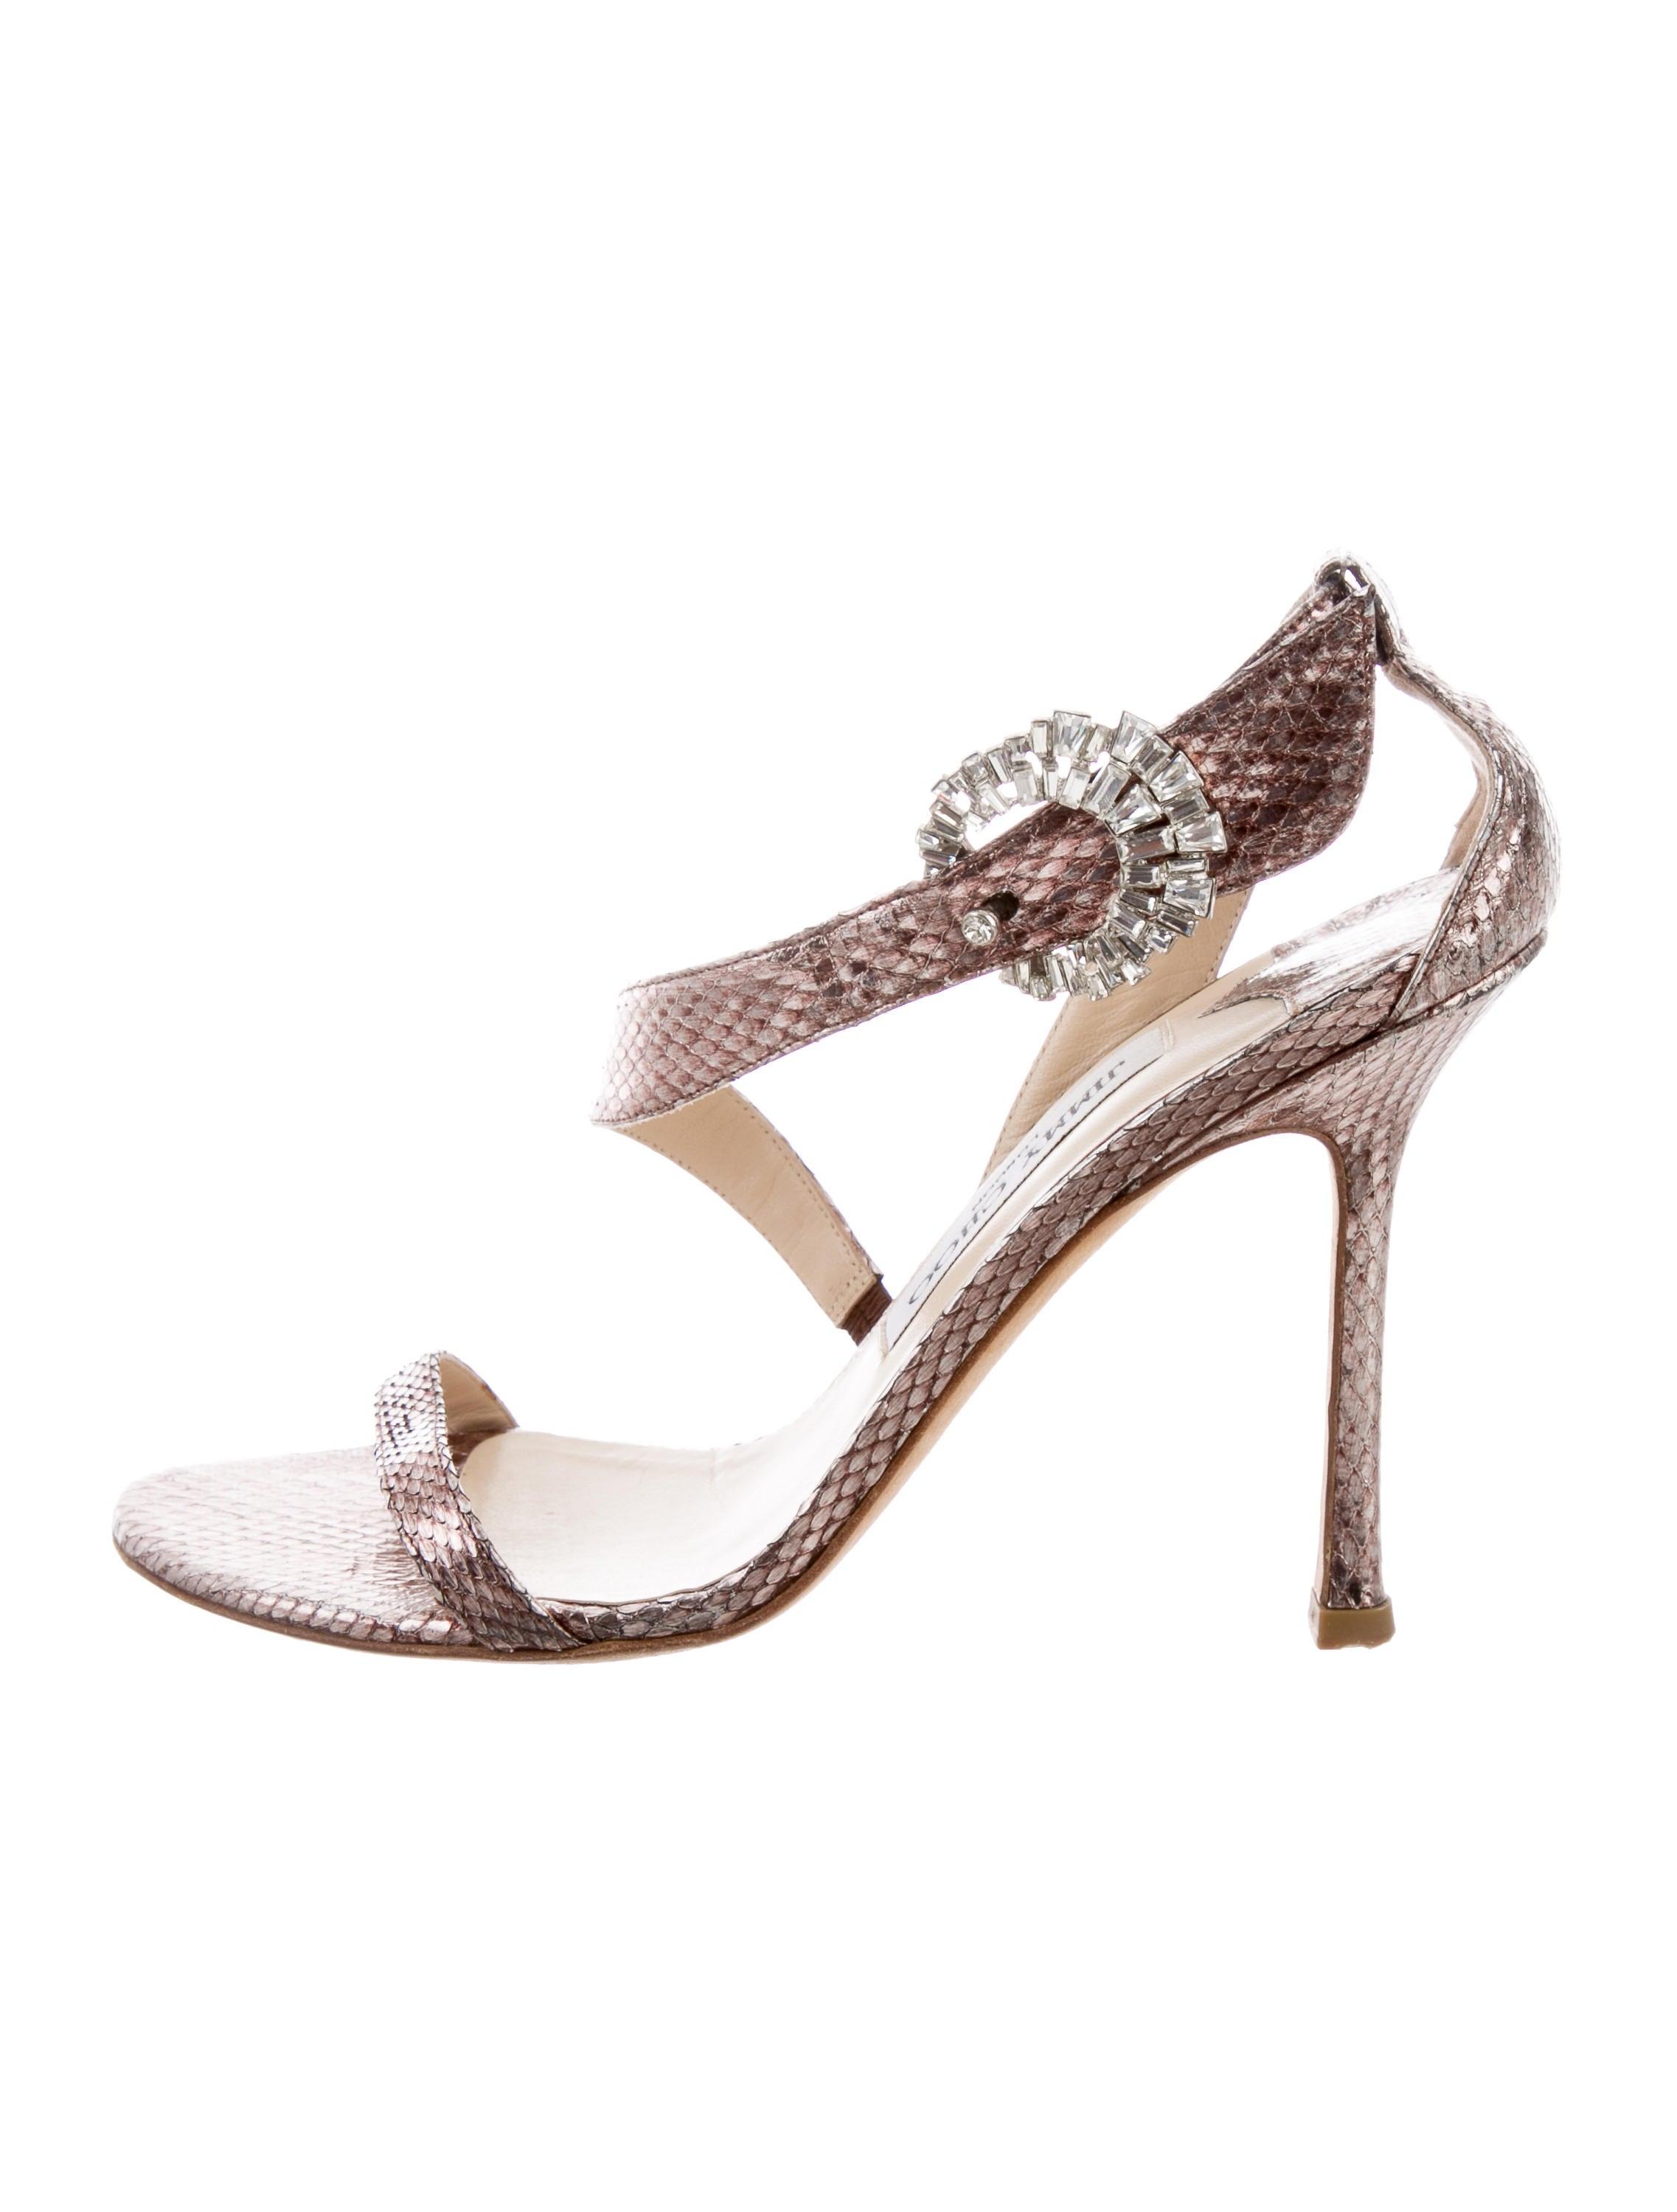 625a39ef20b37a Jimmy Choo Metallic Embossed Sandals - Shoes - JIM98597